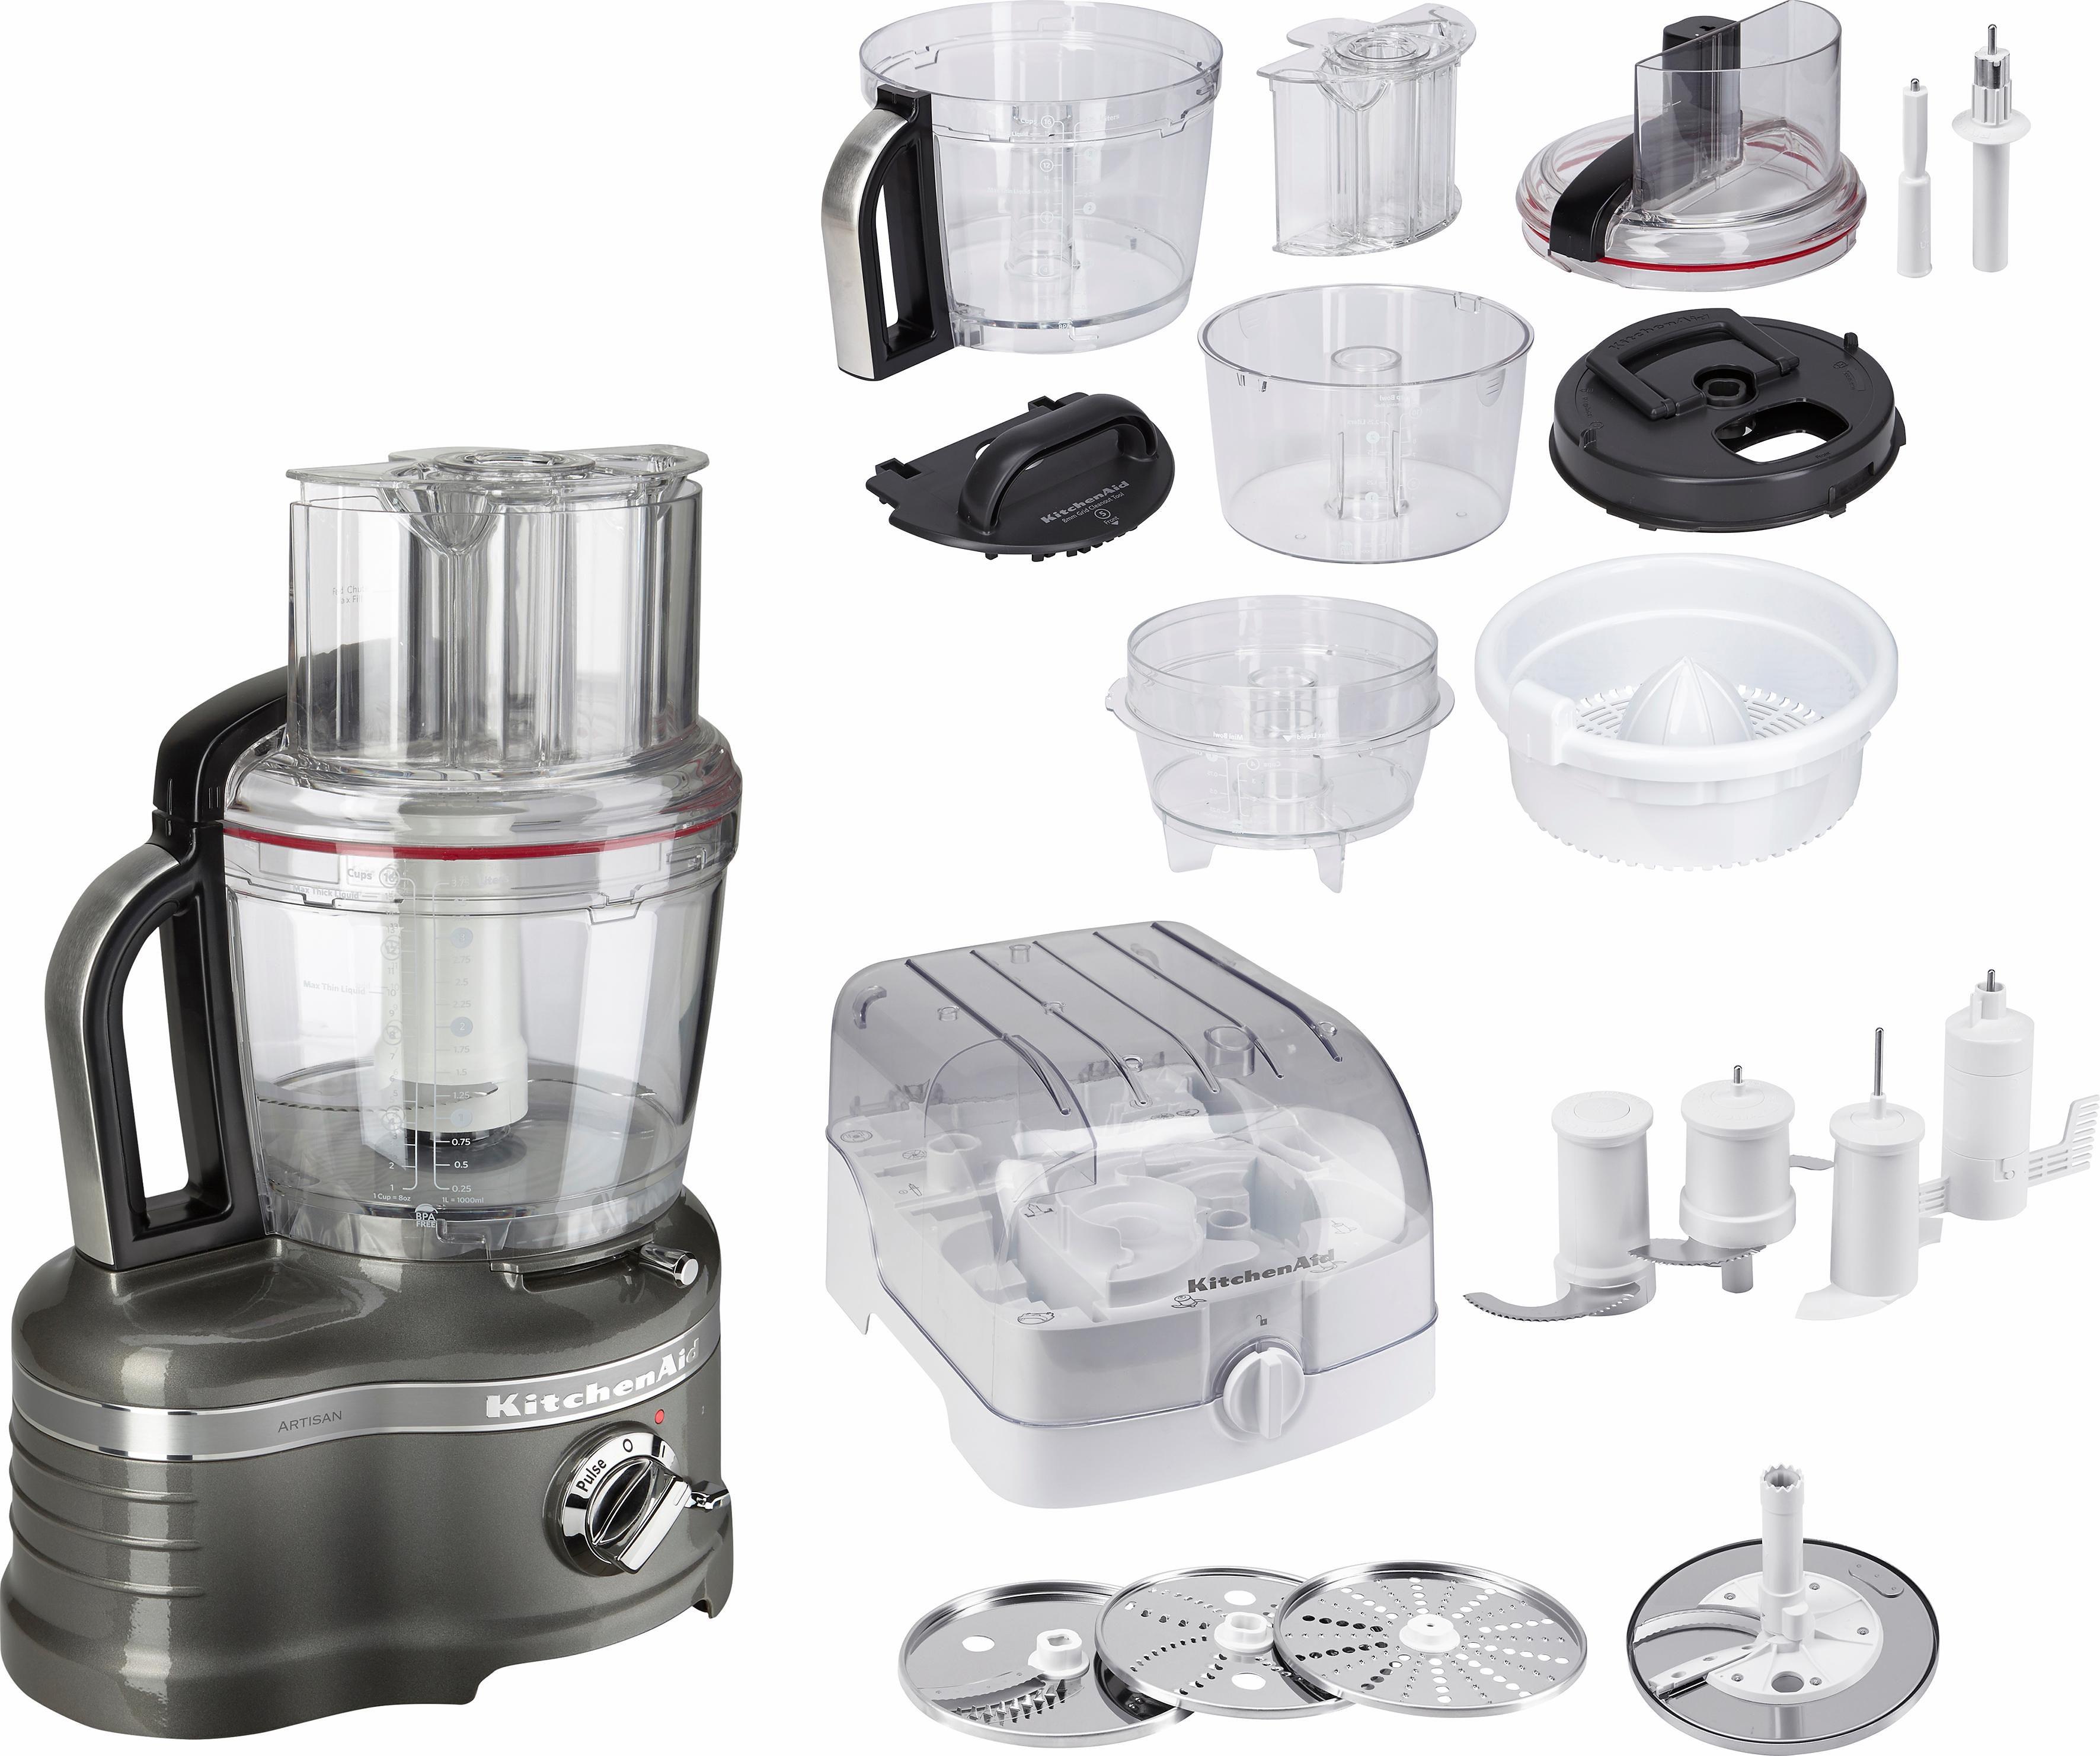 4 Liter KitchenAid Food Processor Artisan 5KFP1644EMS